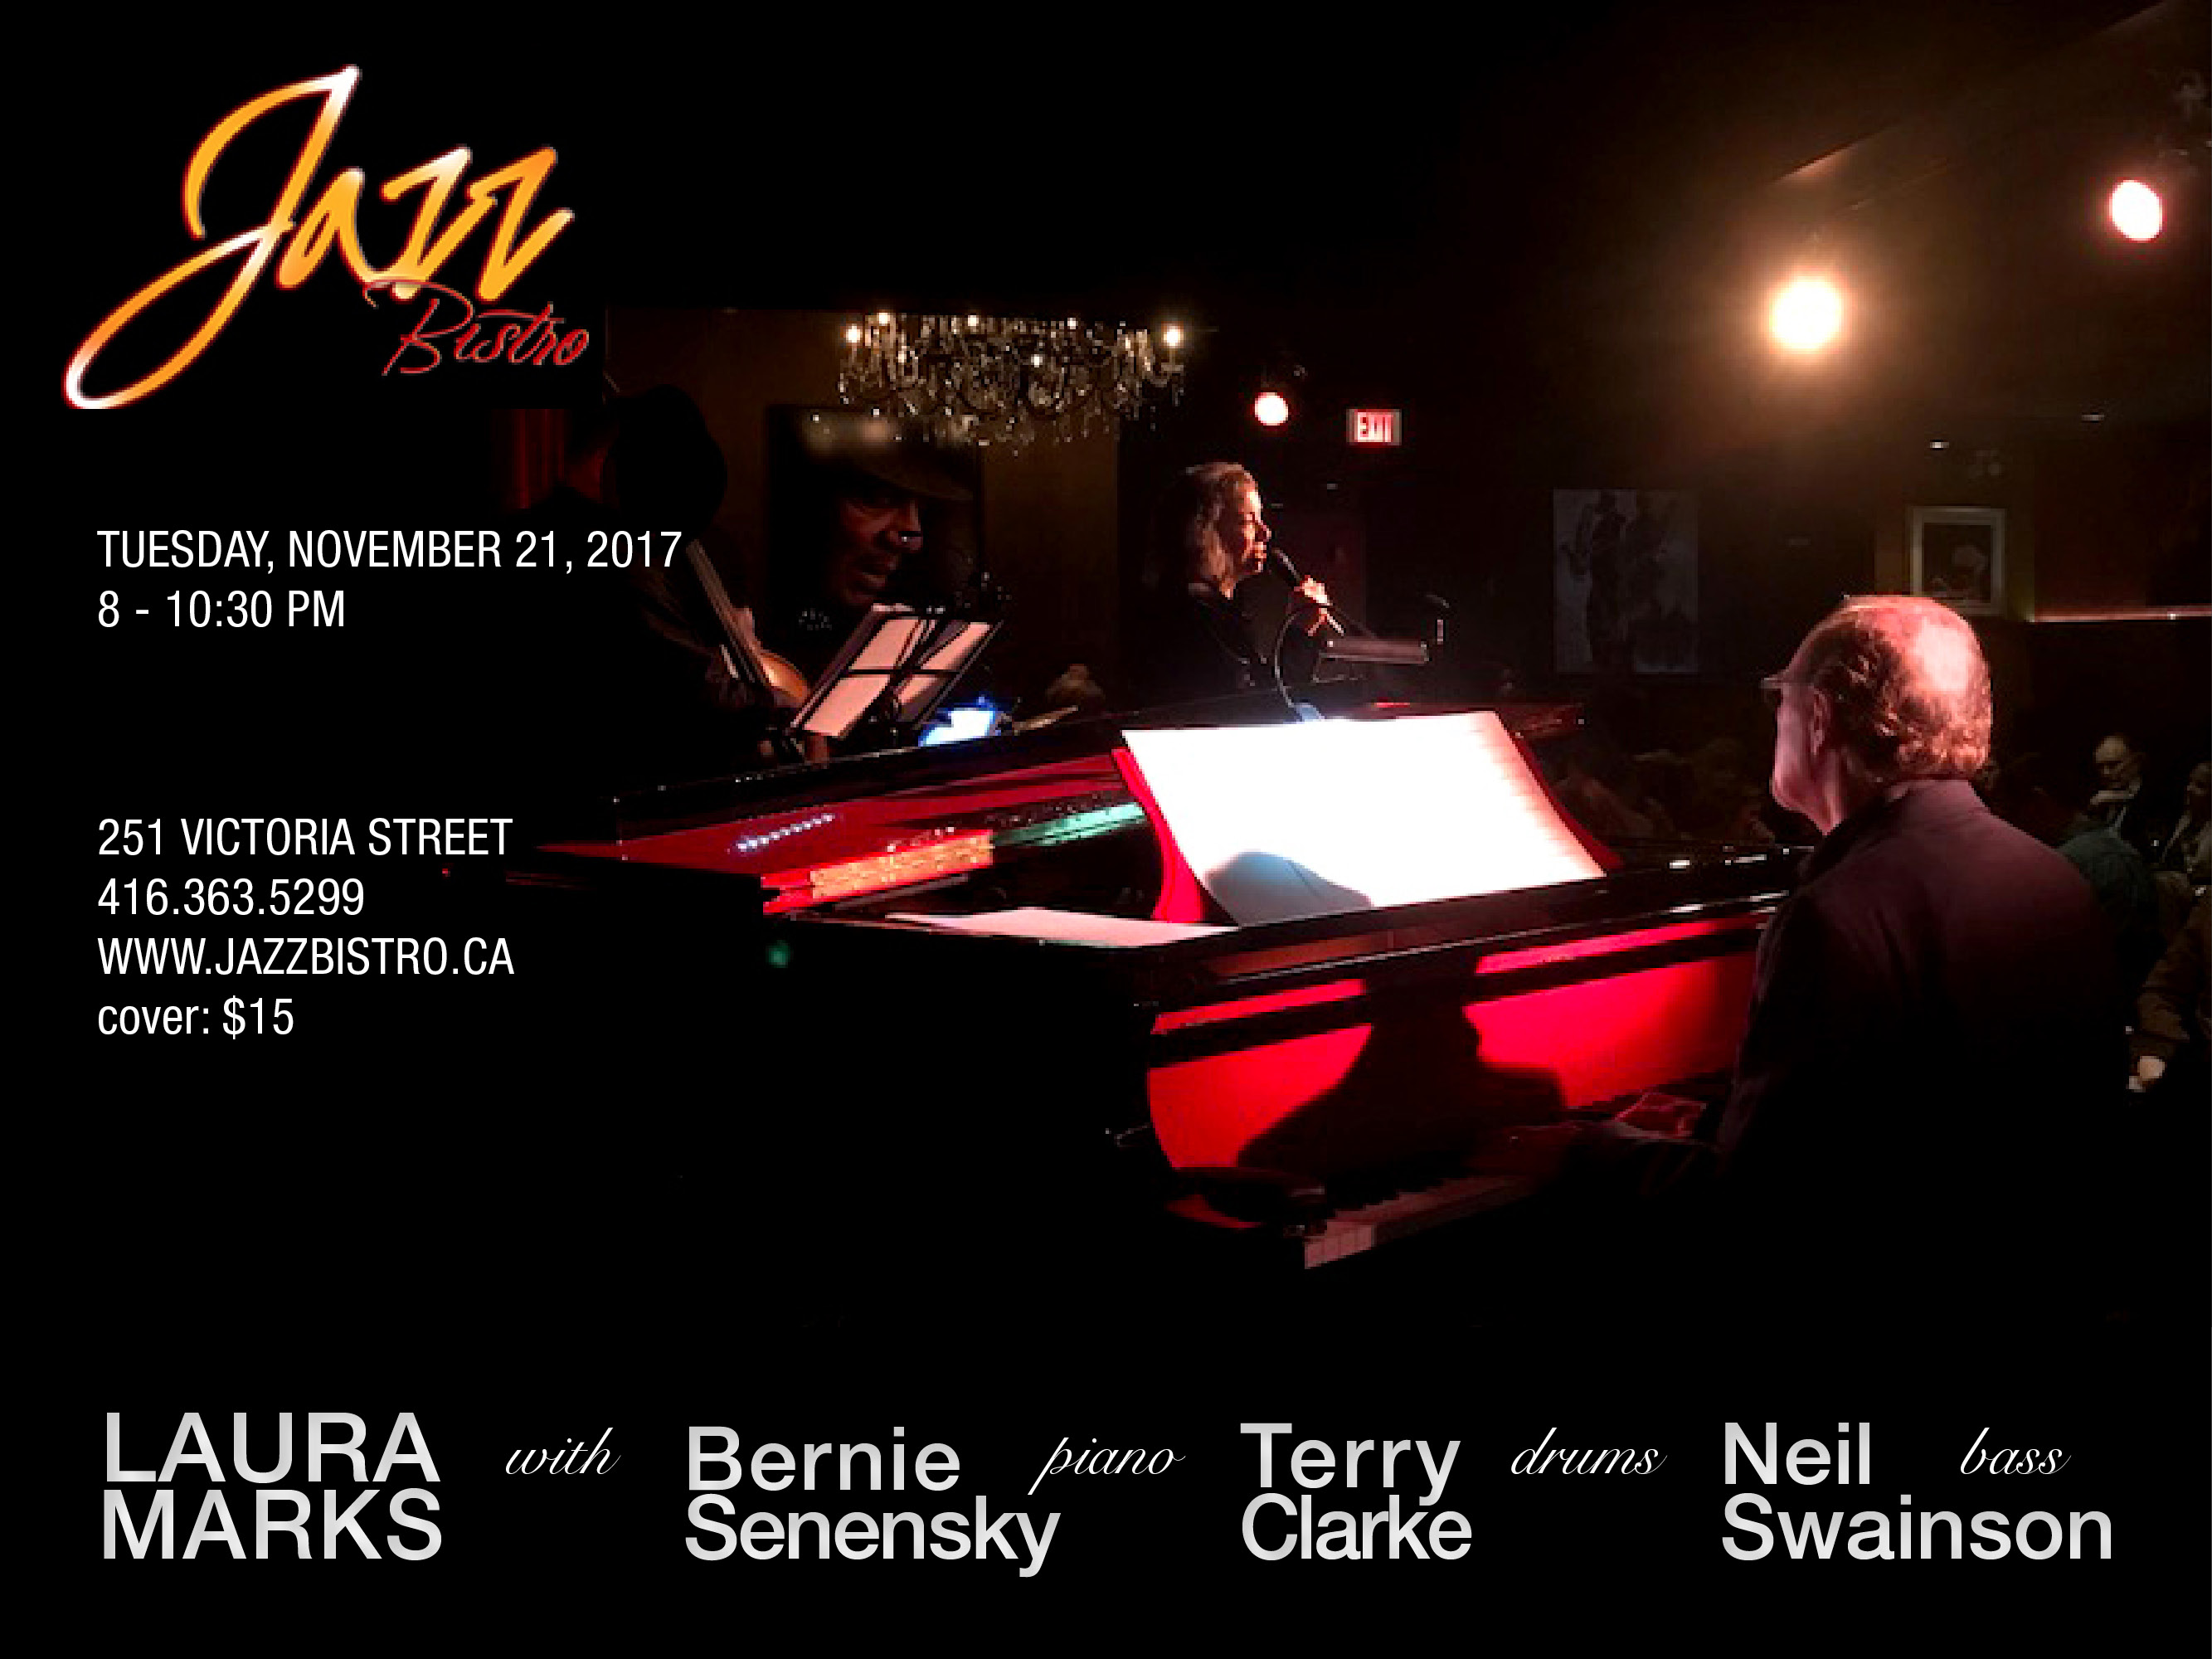 Laura Marks and the Bernie Senensky Trio at Jazz Bistro